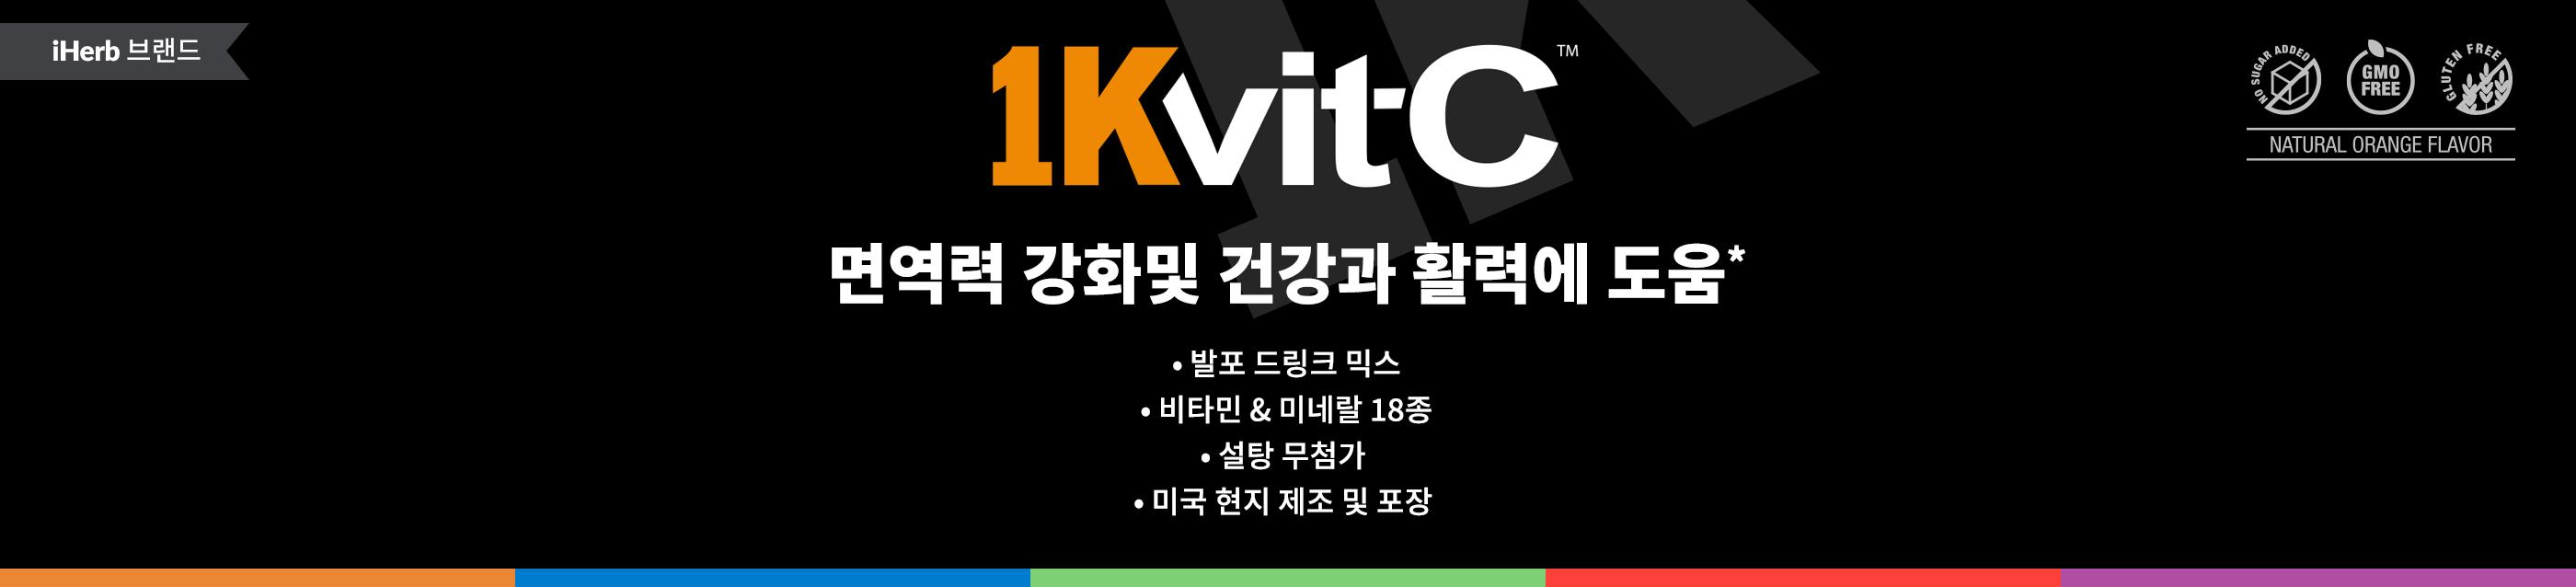 1Kvit-C!